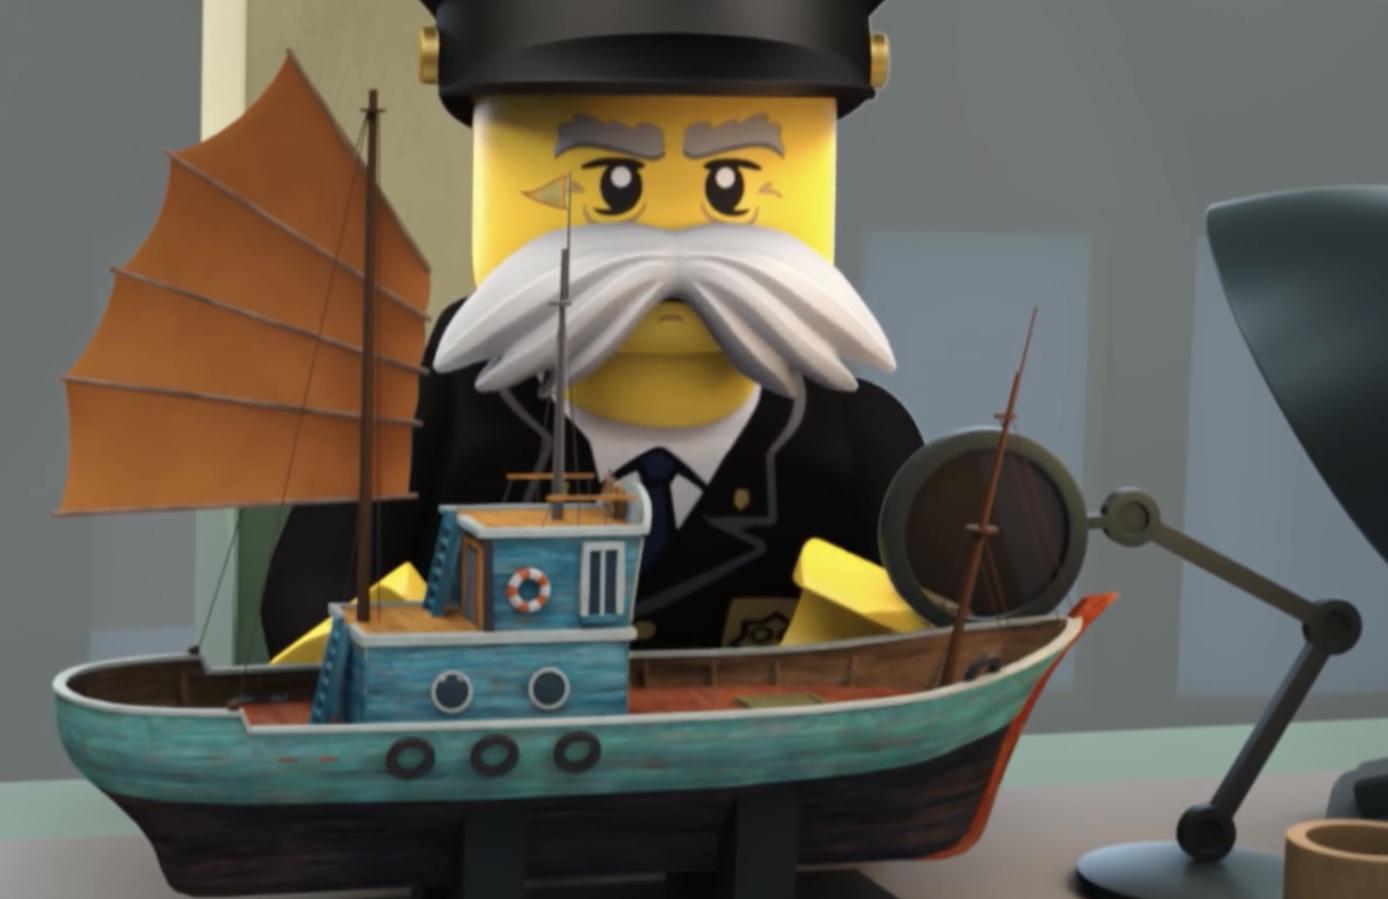 Police Commissioner's Model Boat